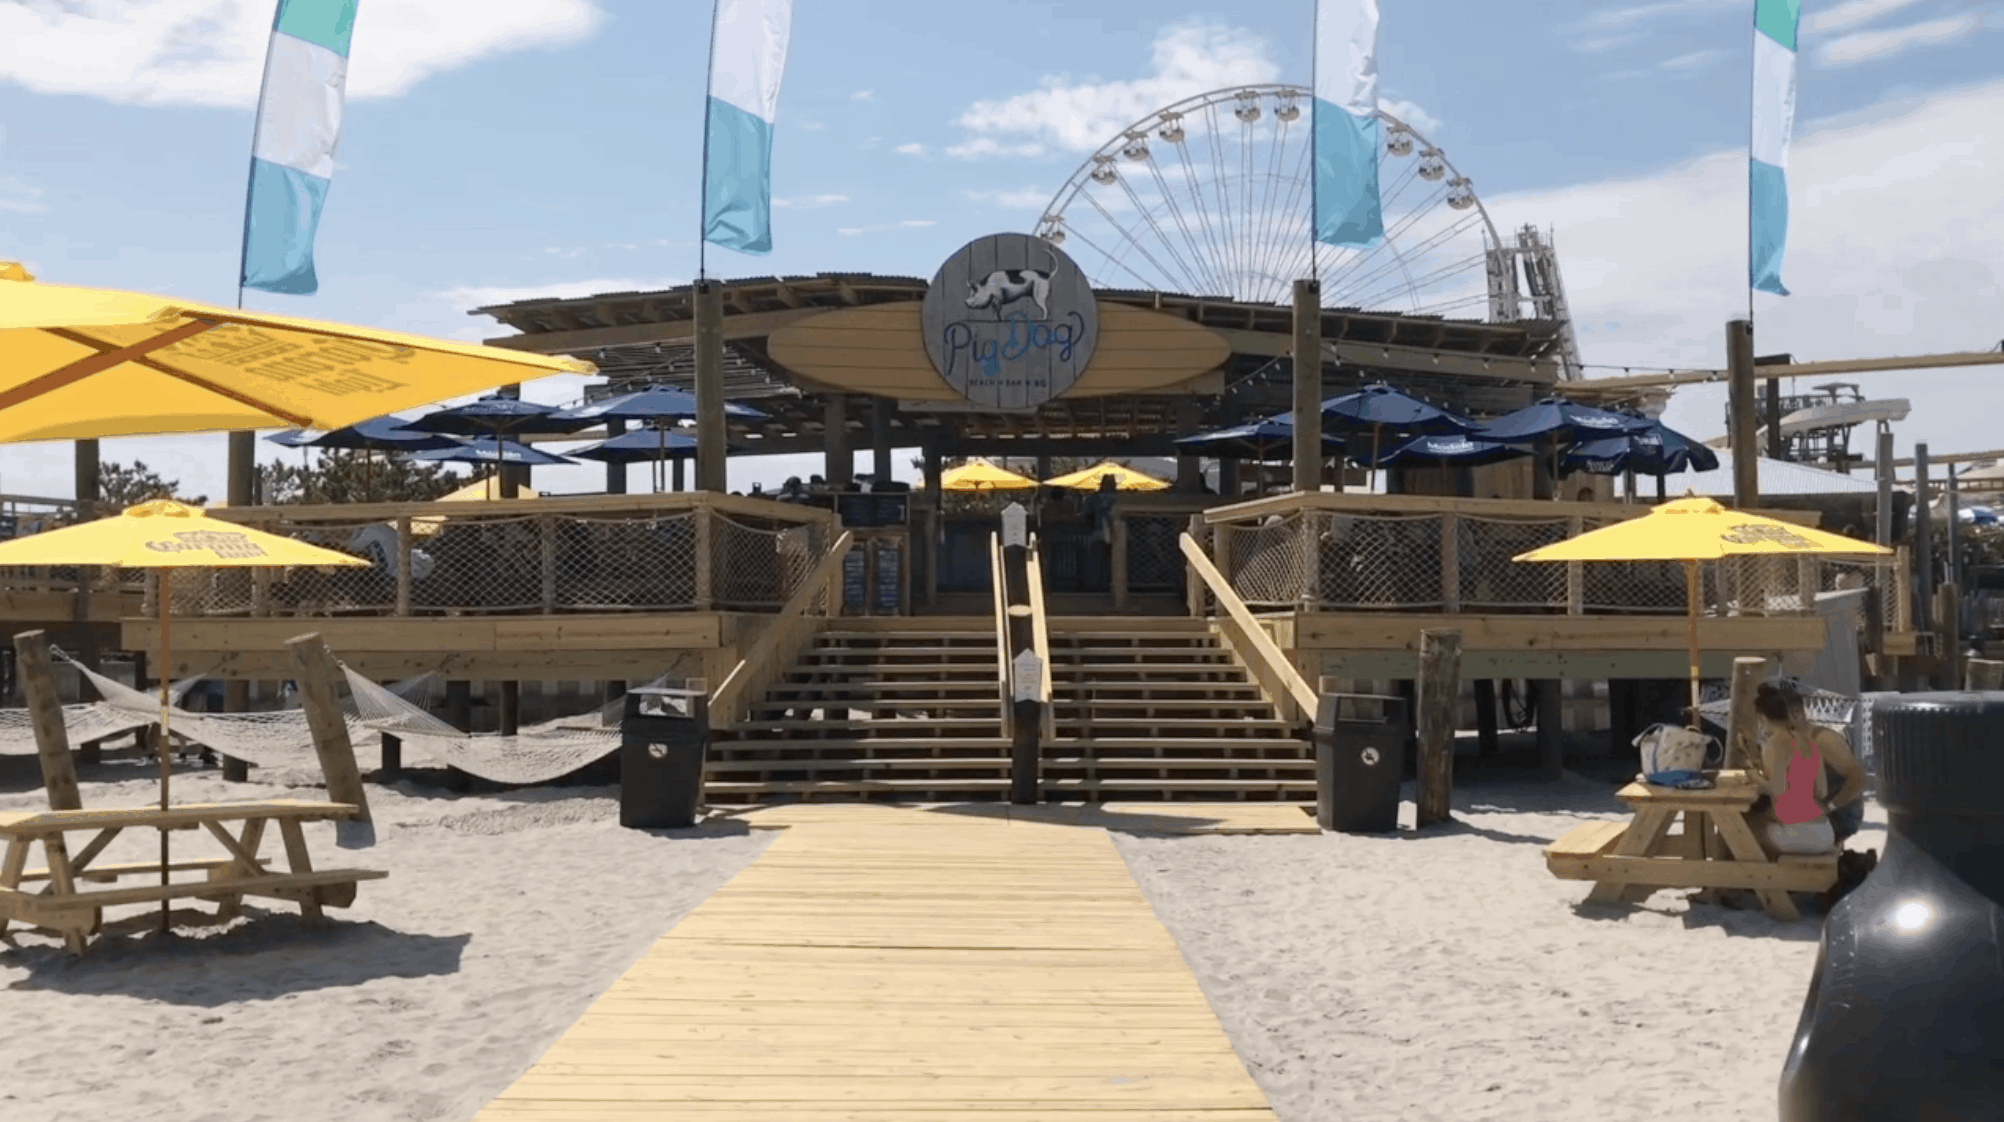 PigDog Beach Bar Tour